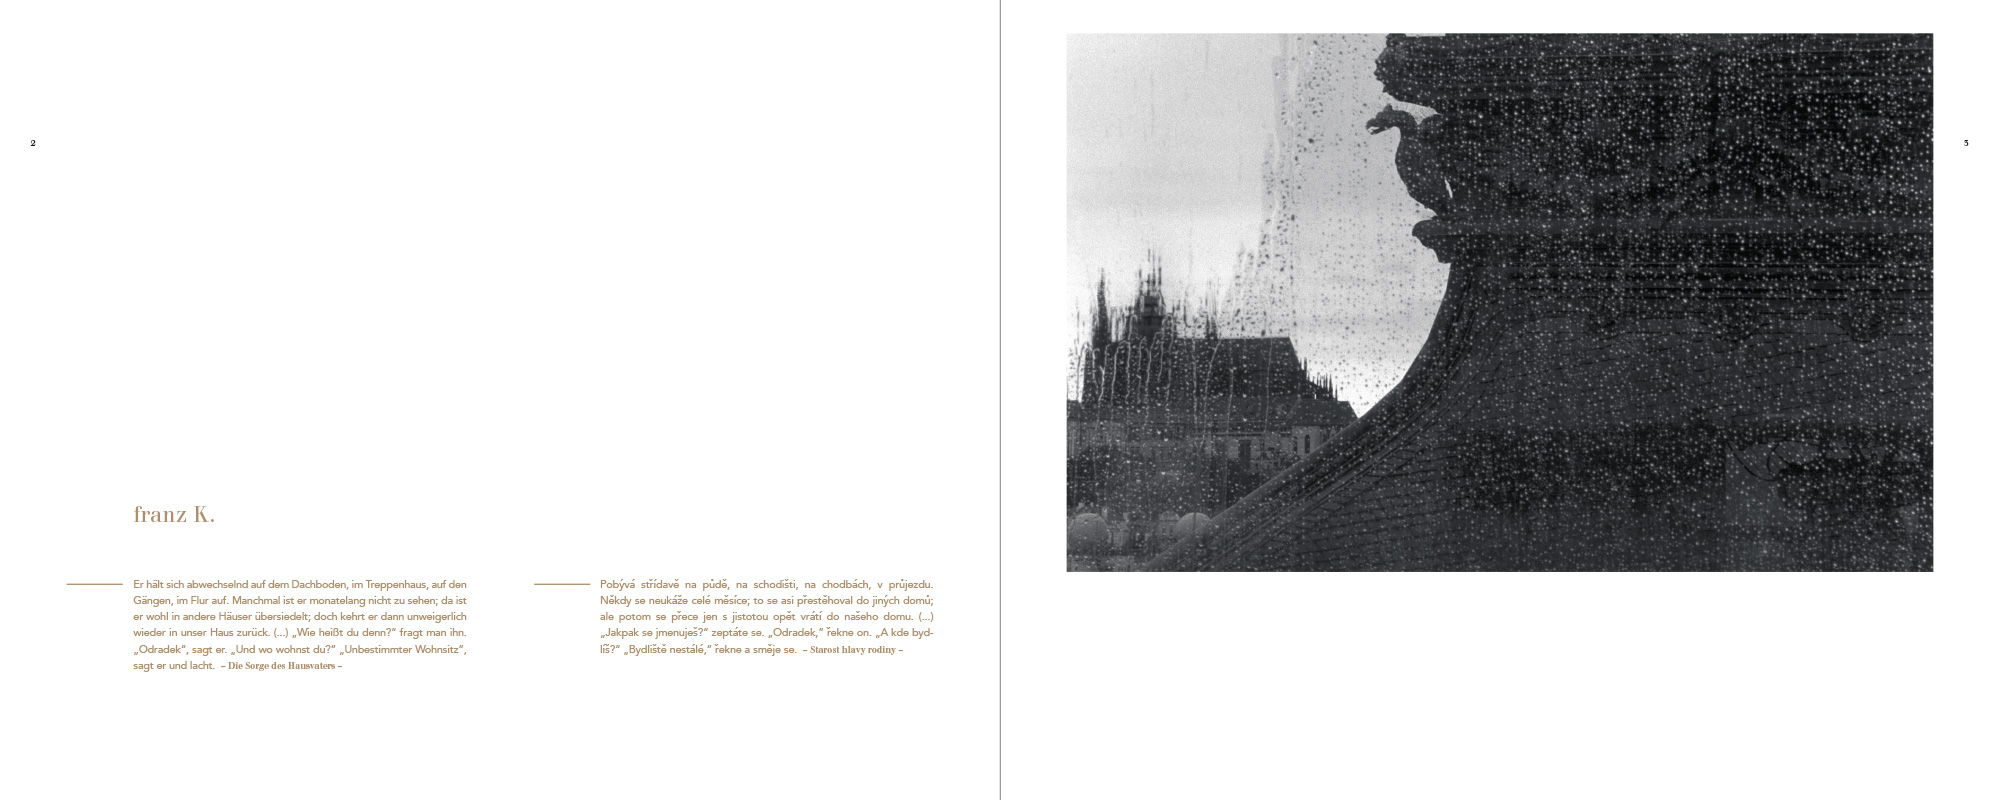 [album/Products_Model_Product/69/Kafka_Cesty_2-6.jpg]